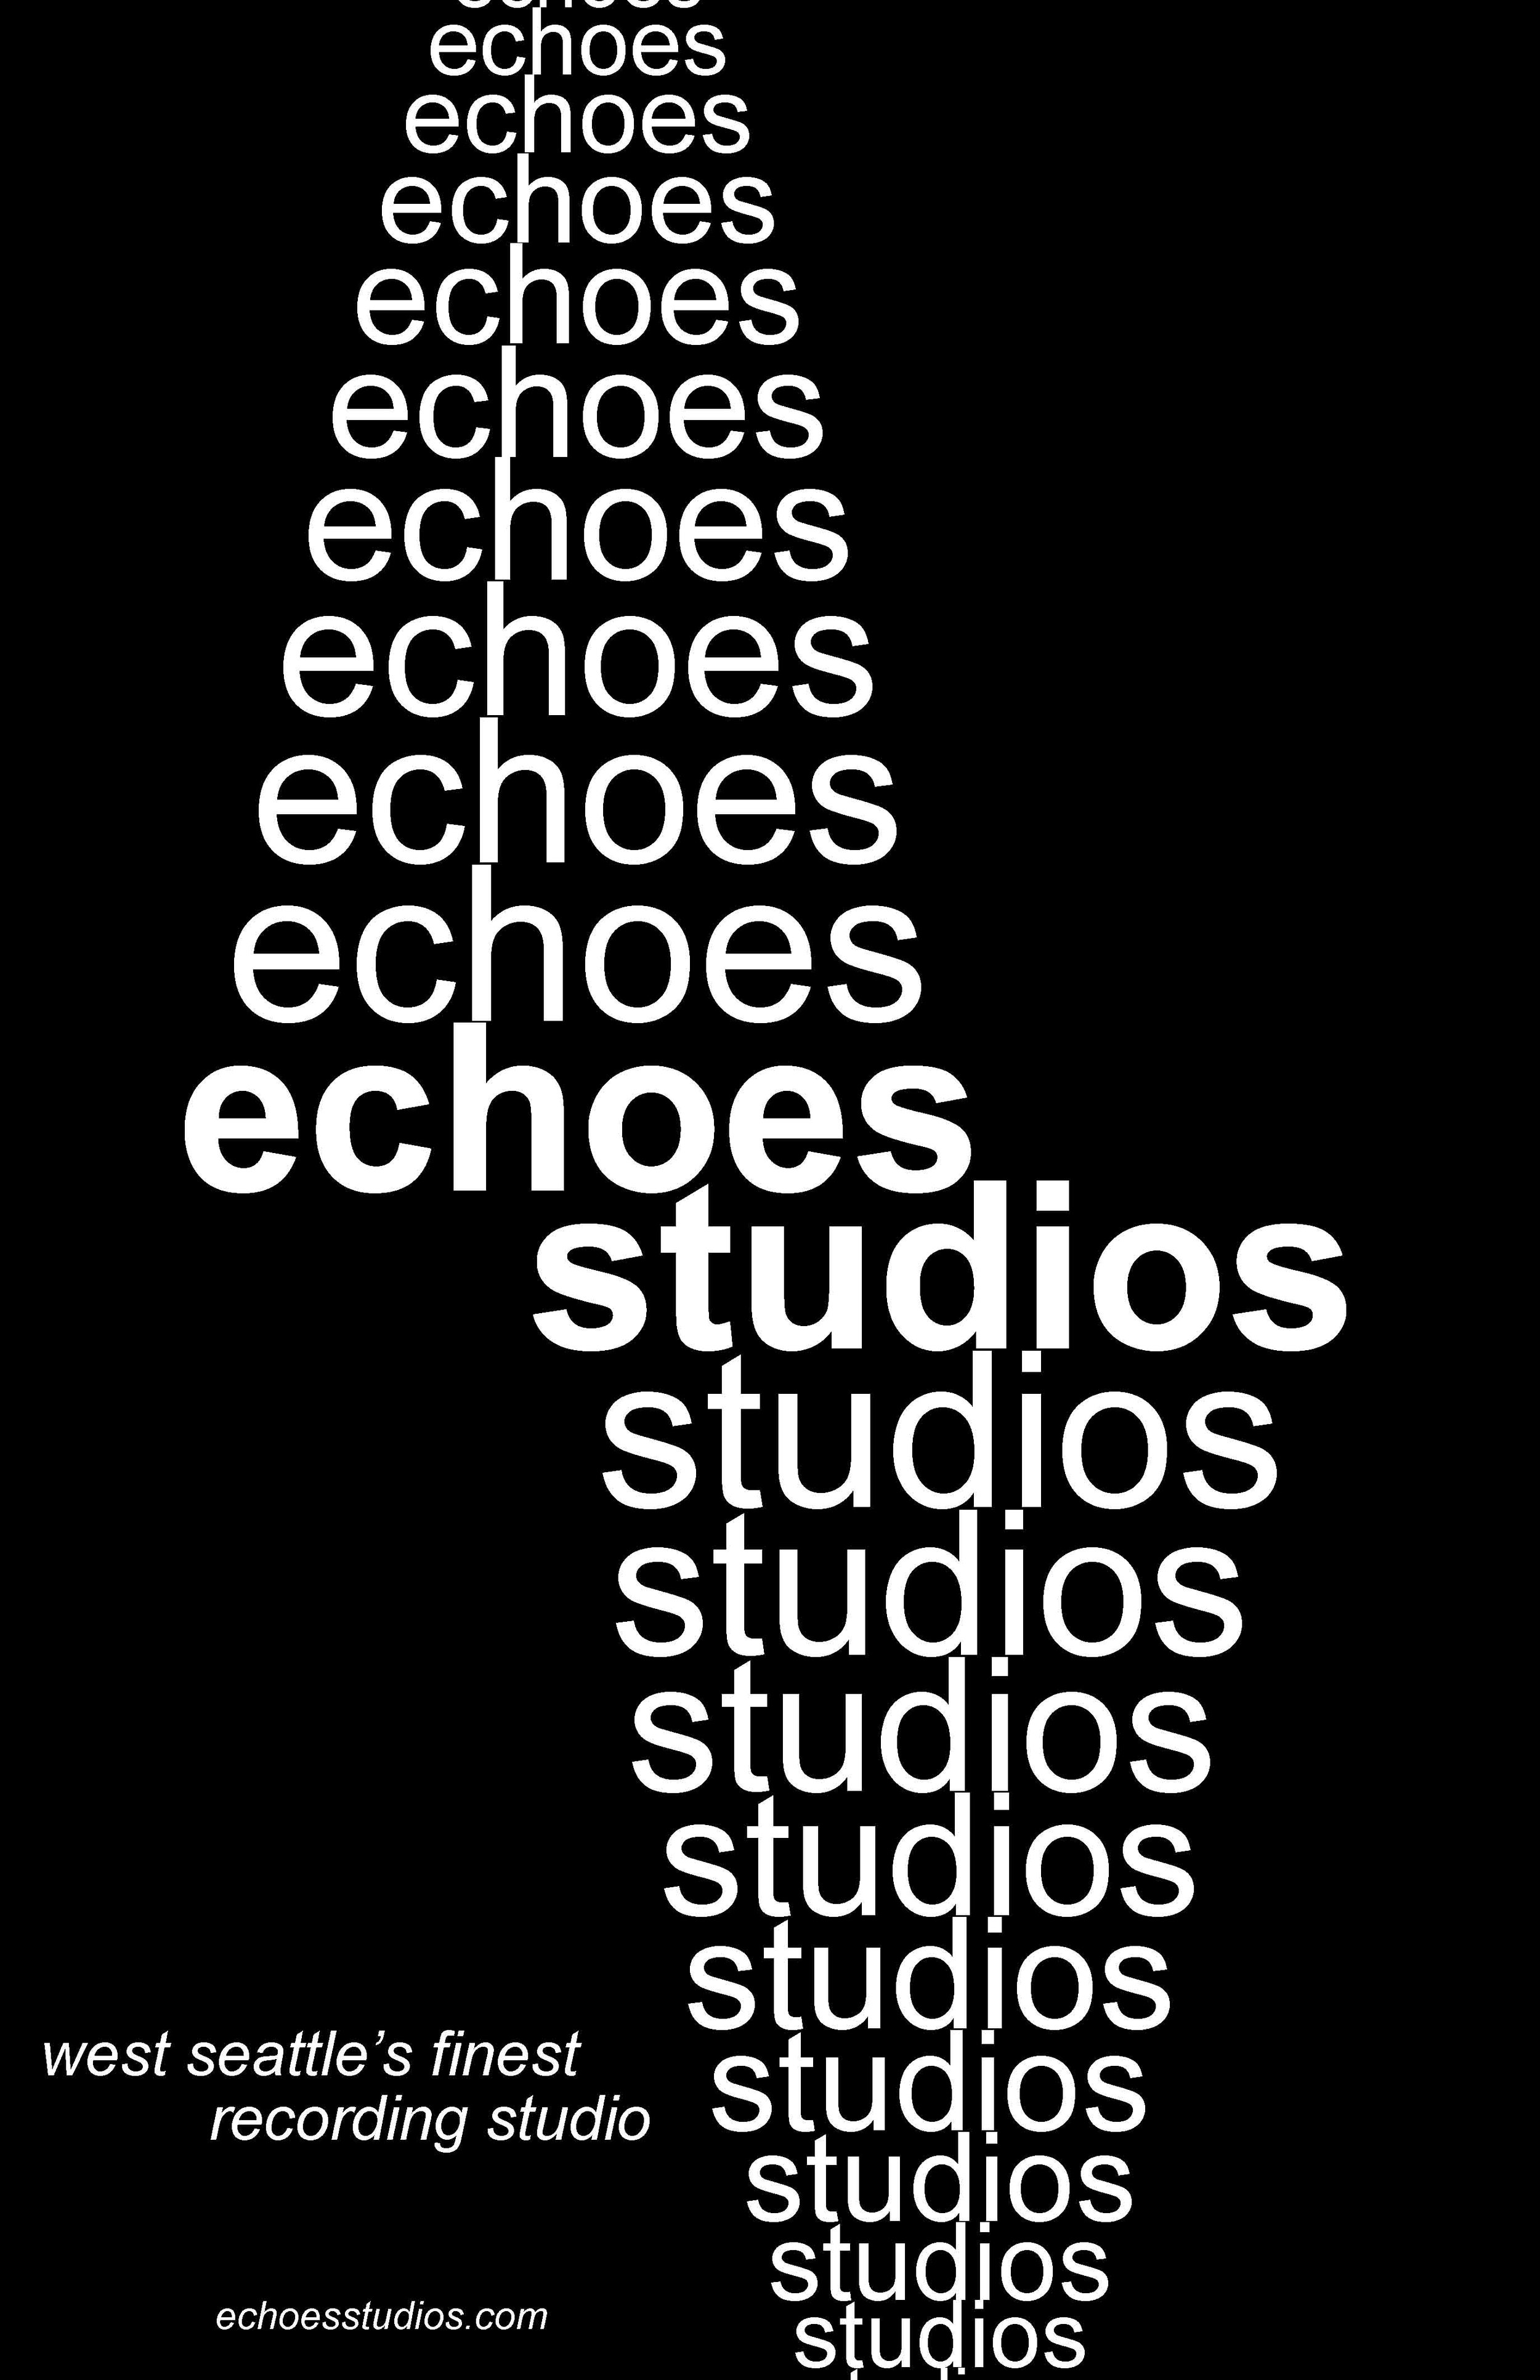 echoes lava logo poster.jpg